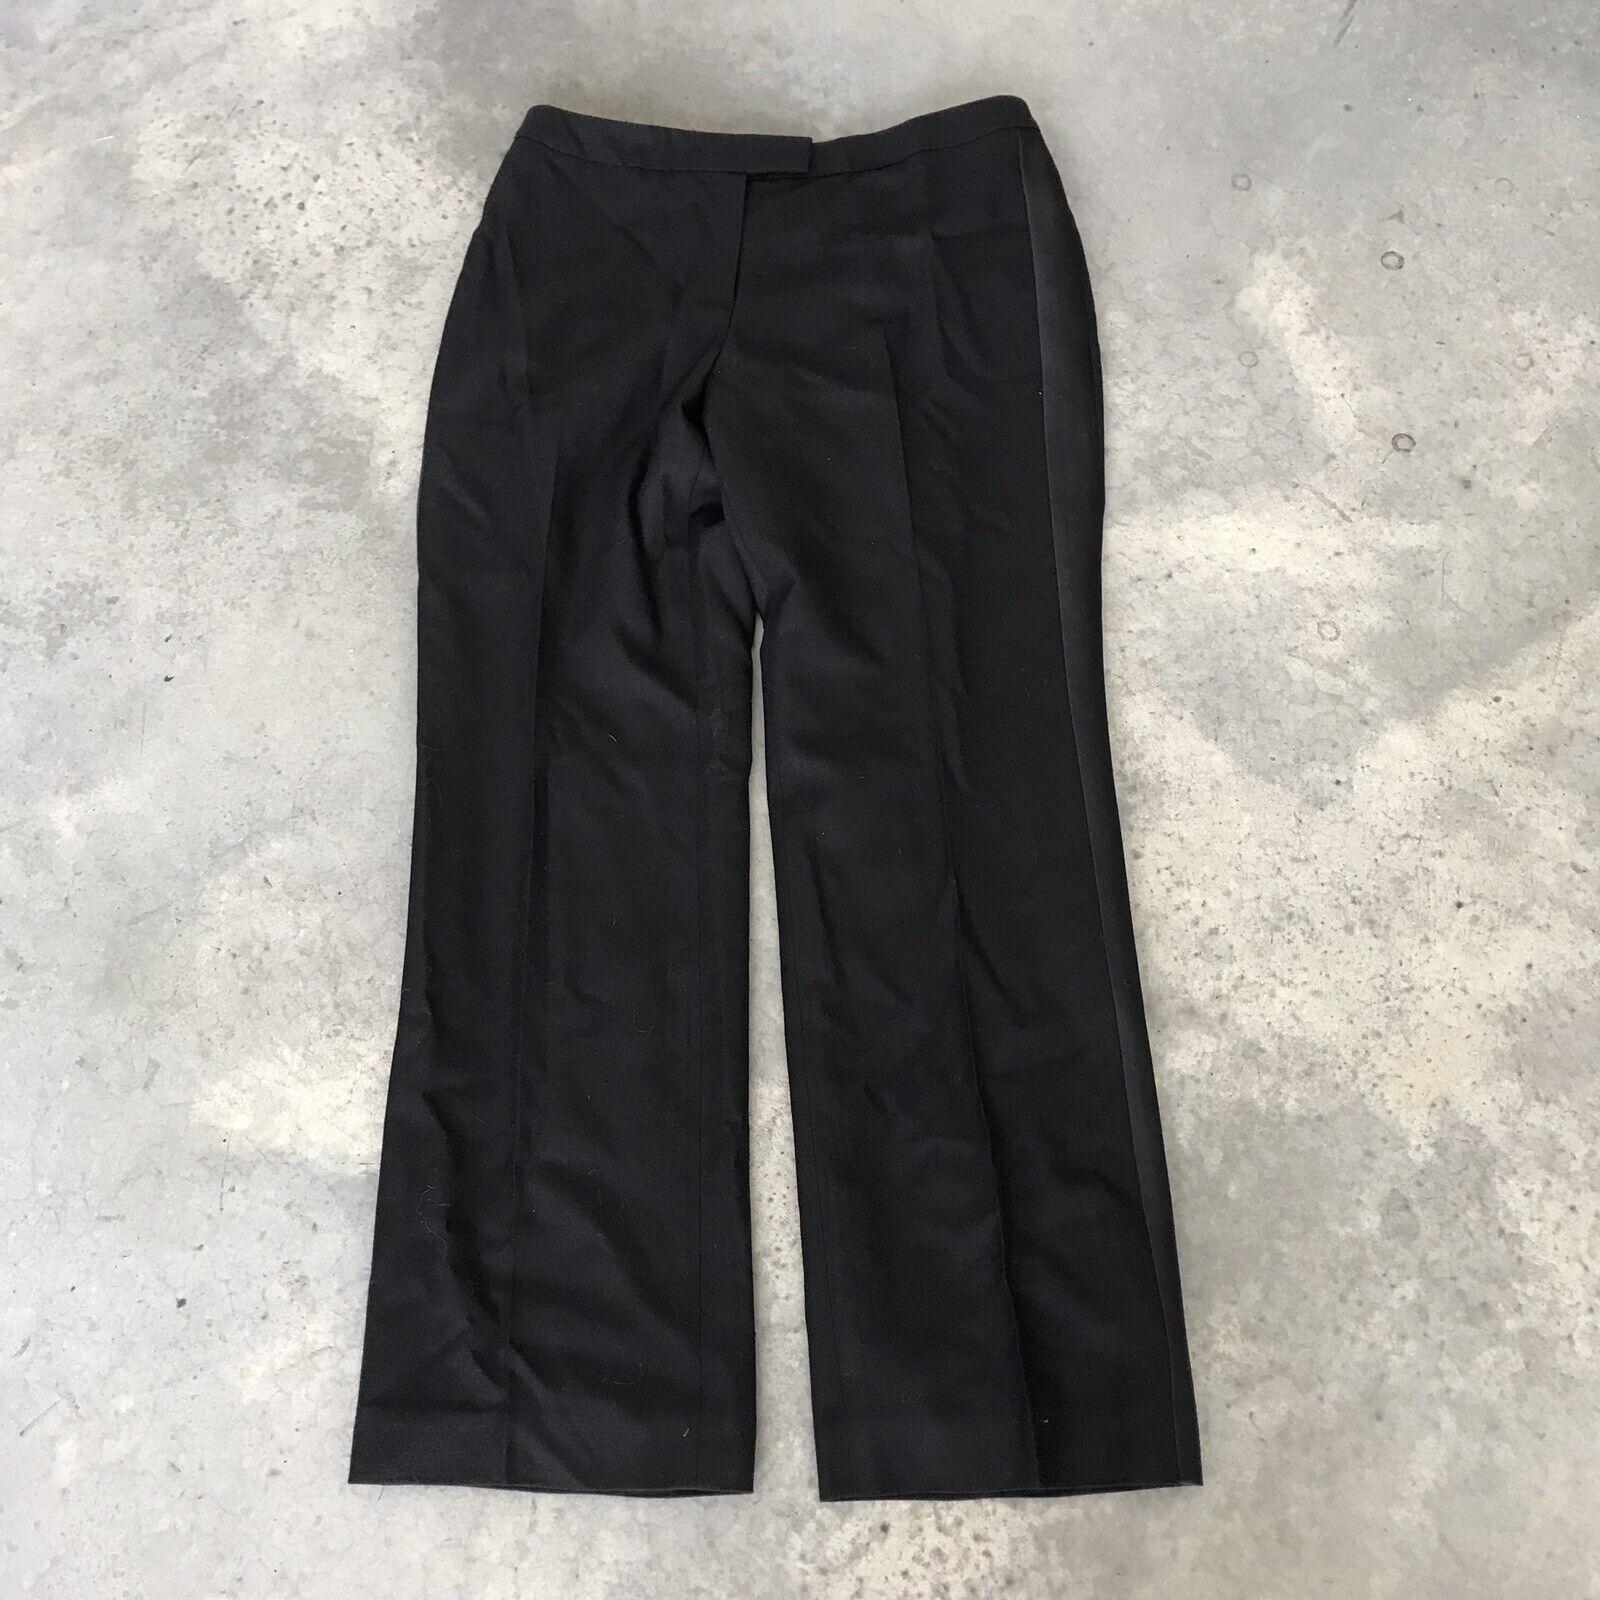 346 Brooks Brothers 100% Wolle damen Trouser Kleid Tuxedo Trousers Sz 12